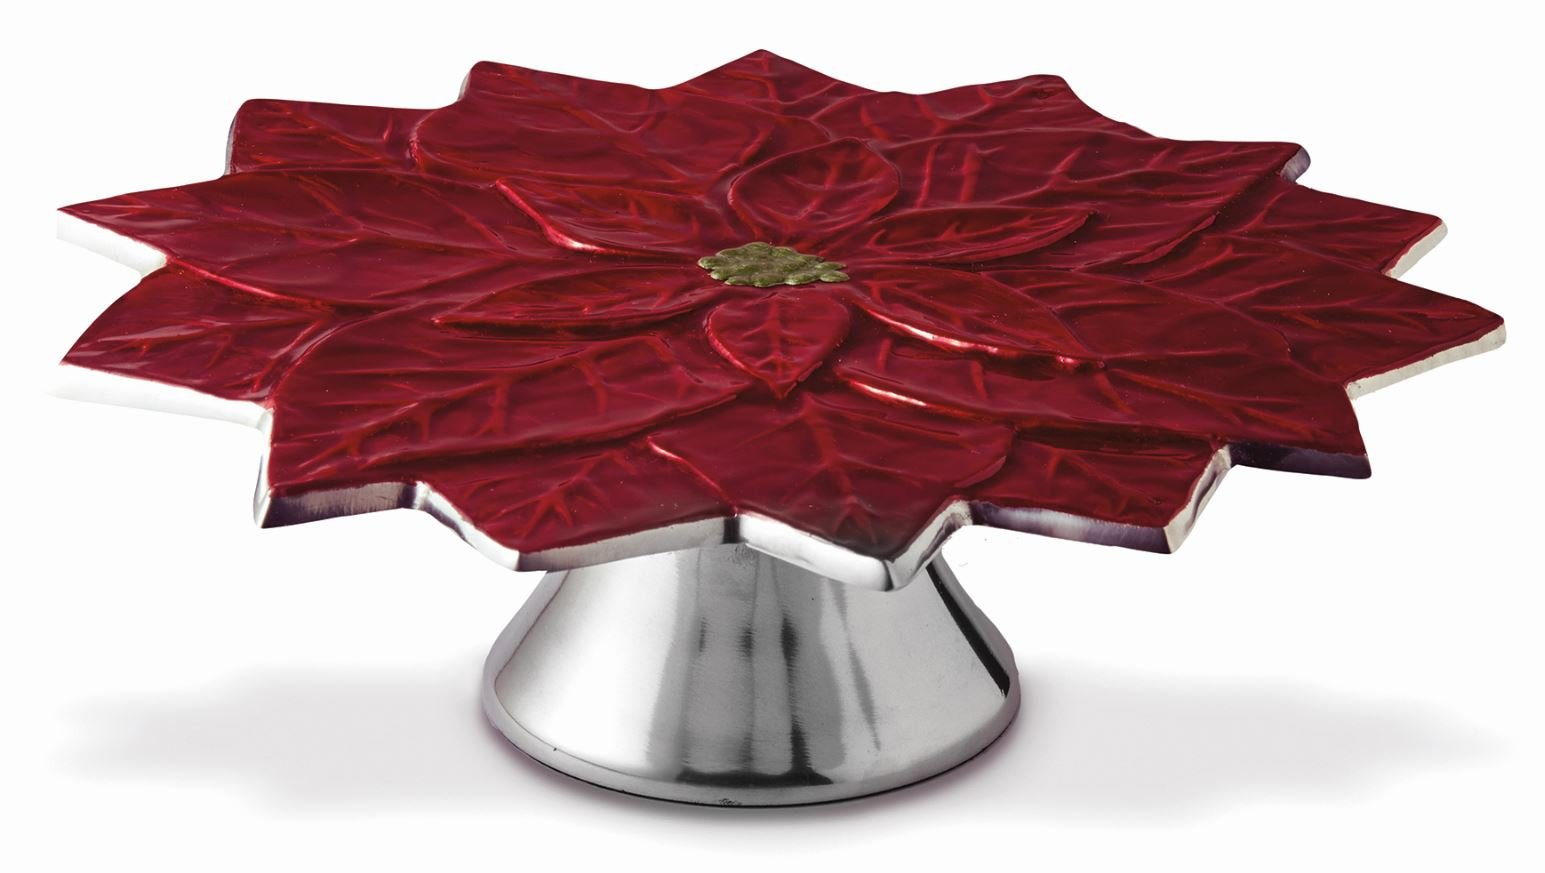 Julia Knight Poinsettia 13'' Cake Stand, Pomegranate, Red